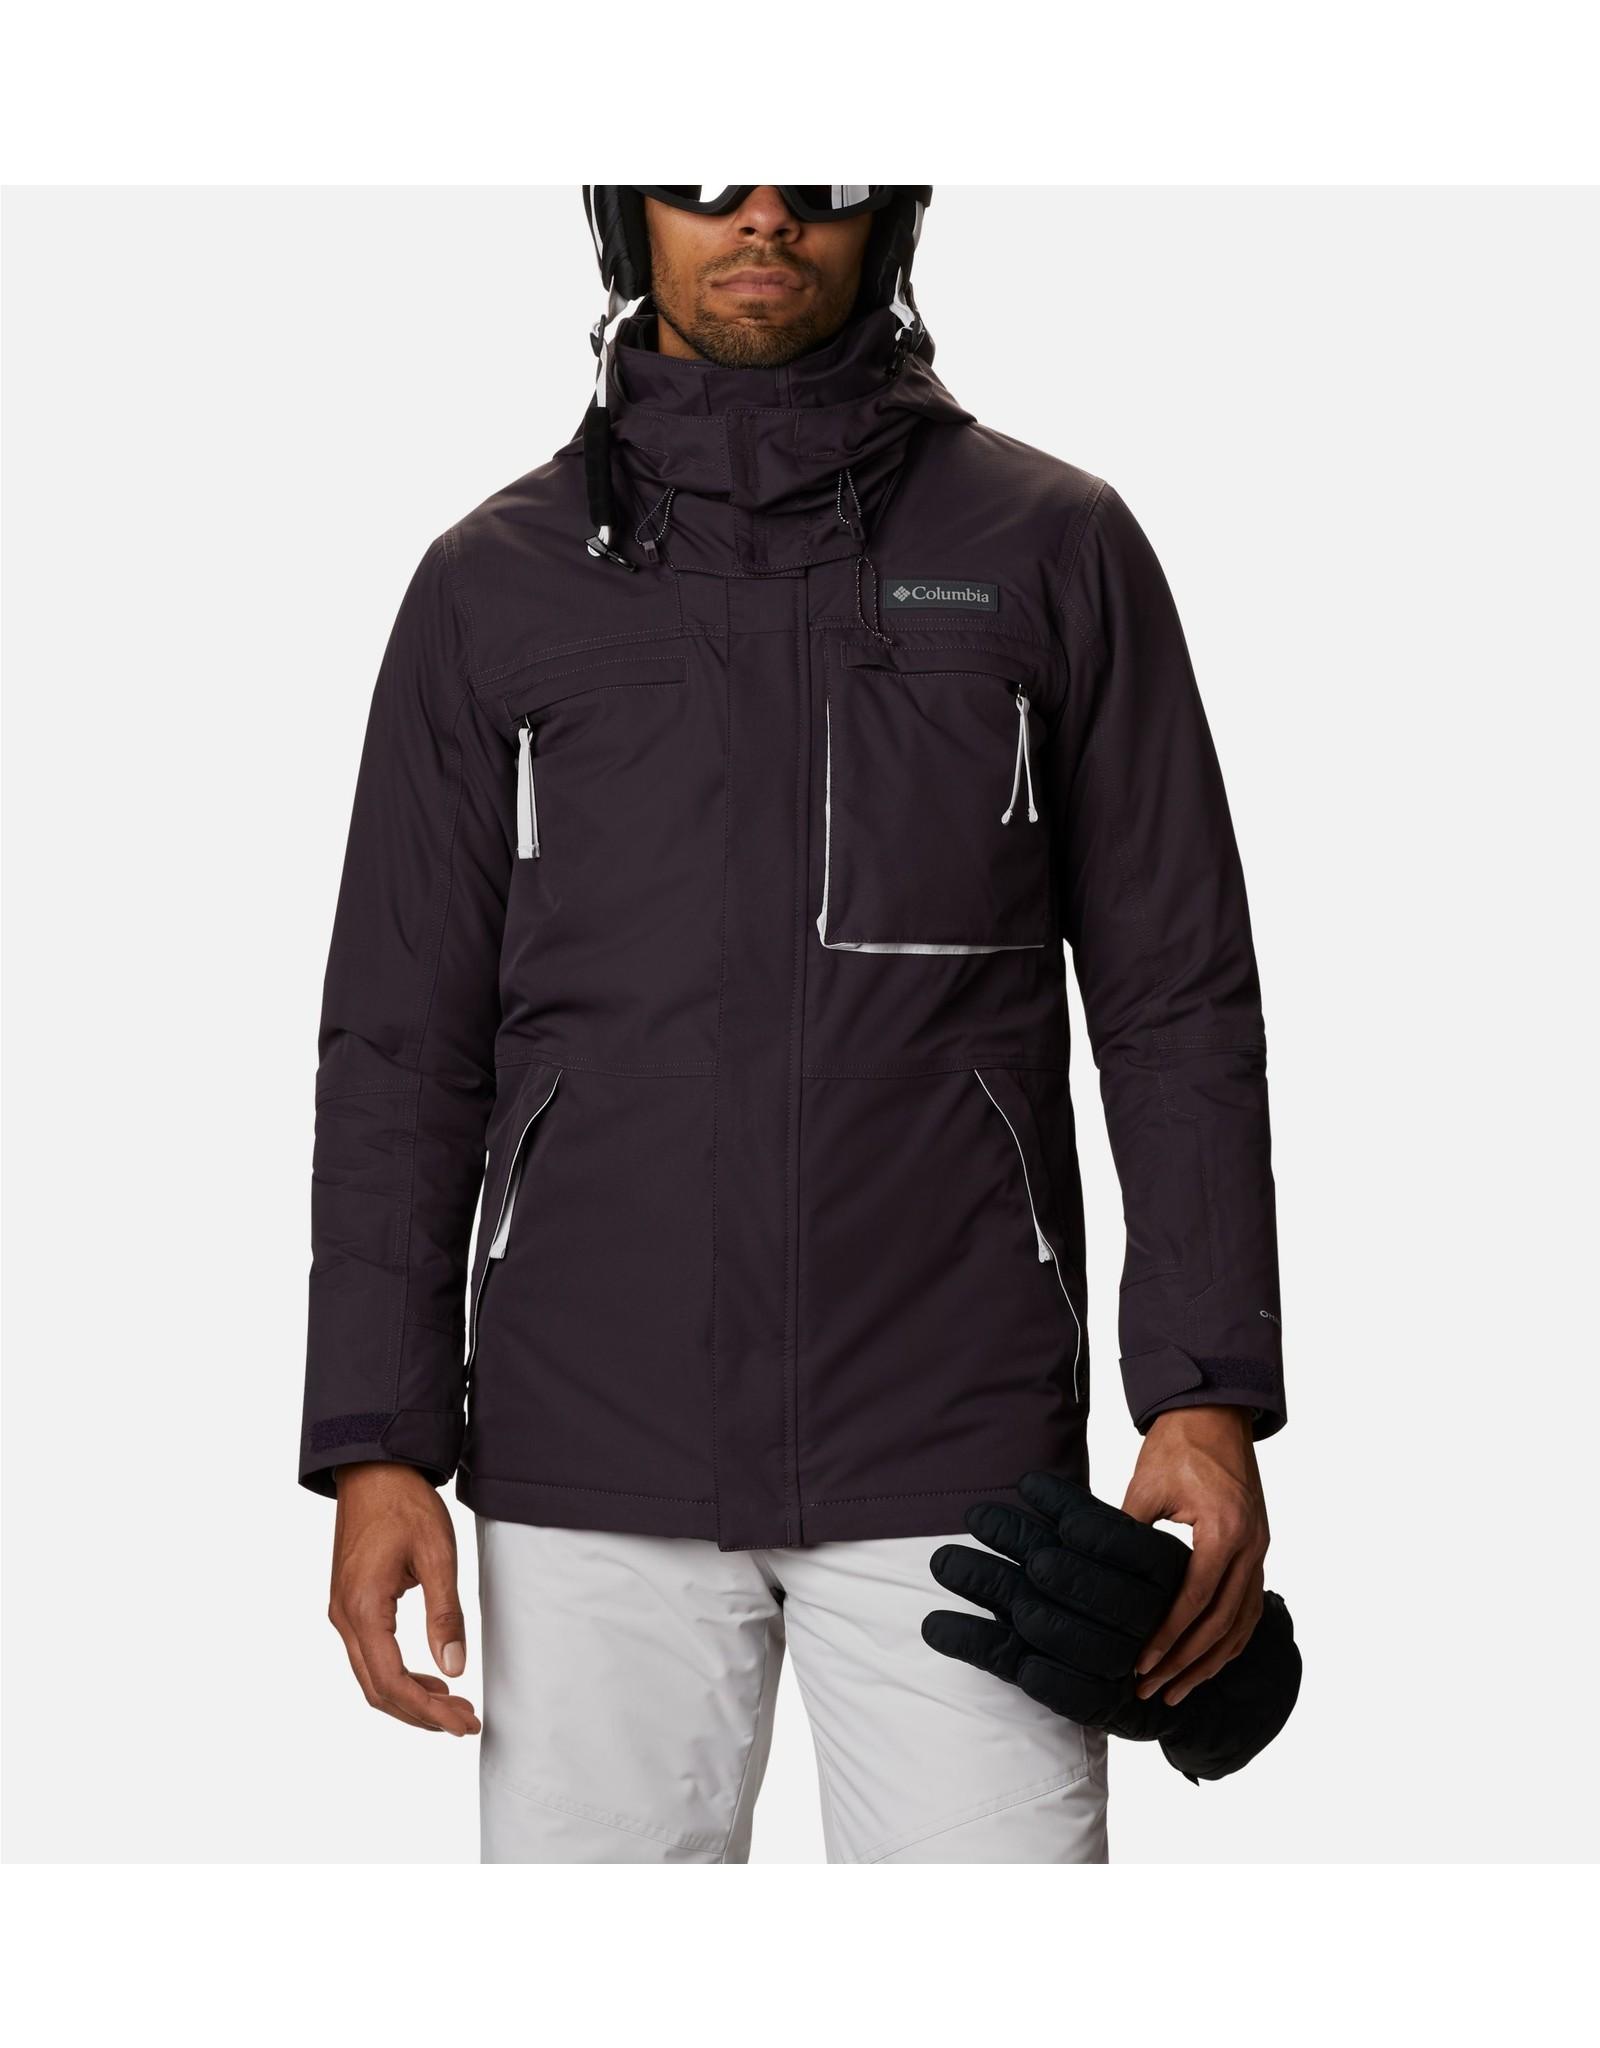 Columbia Park Run Jacket 2021